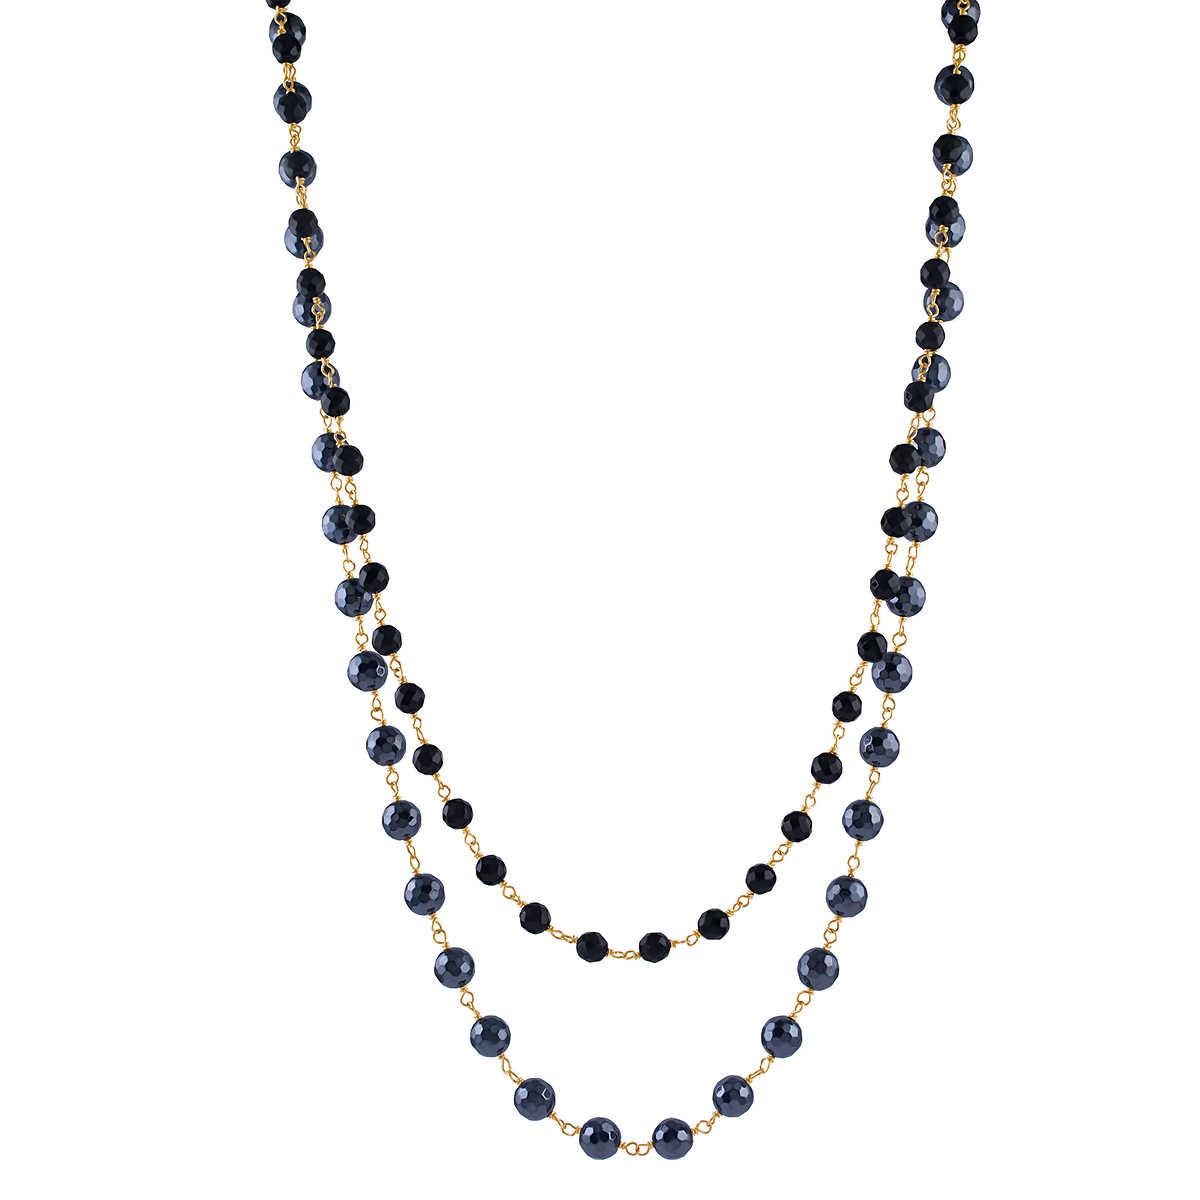 164e2829e45fb4 Hematite and Black Onyx 14kt Yellow Gold Necklace